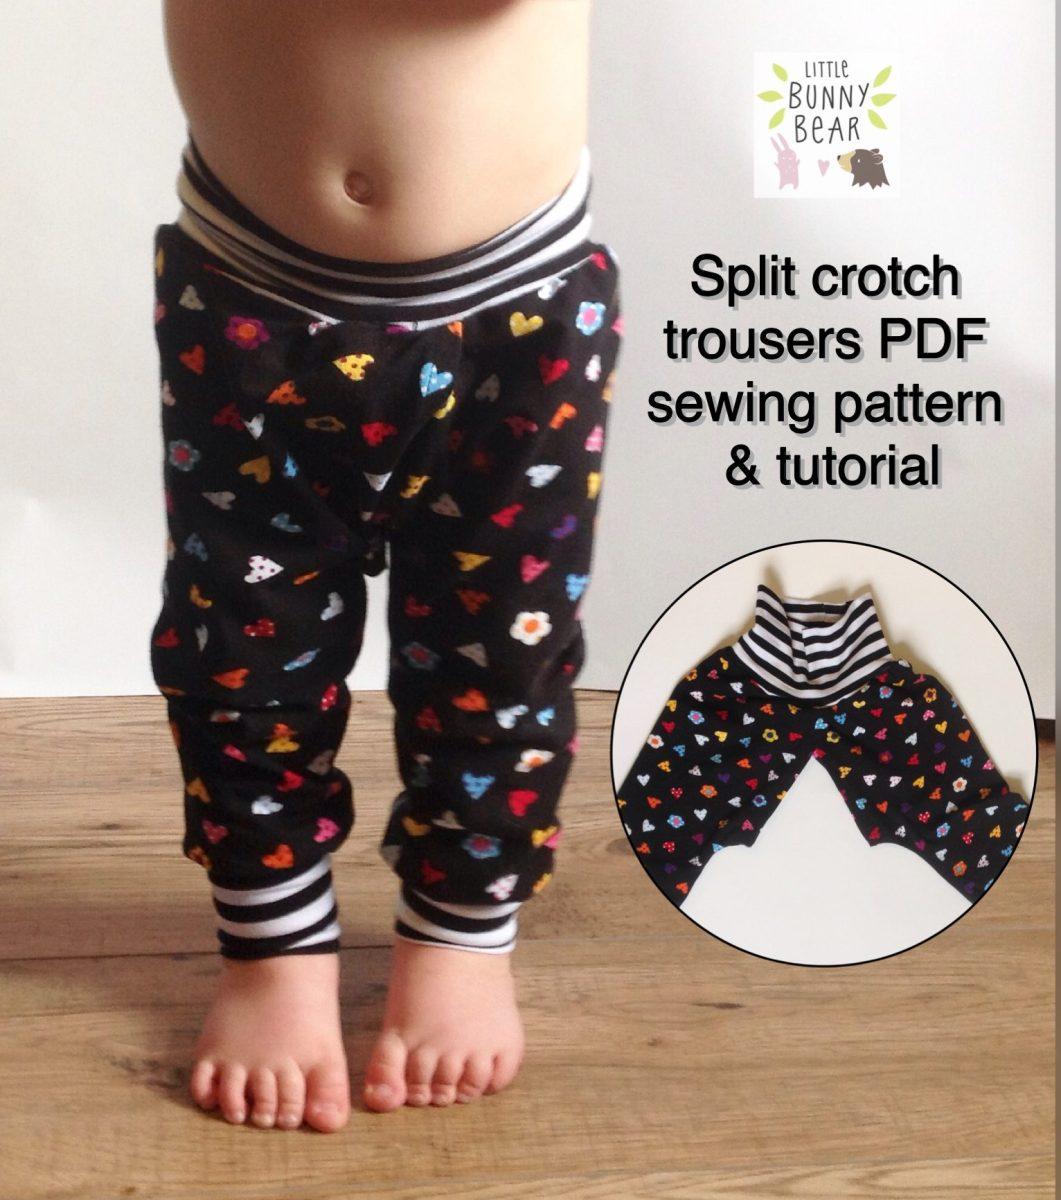 DIY split crotch clothing for elimination communication